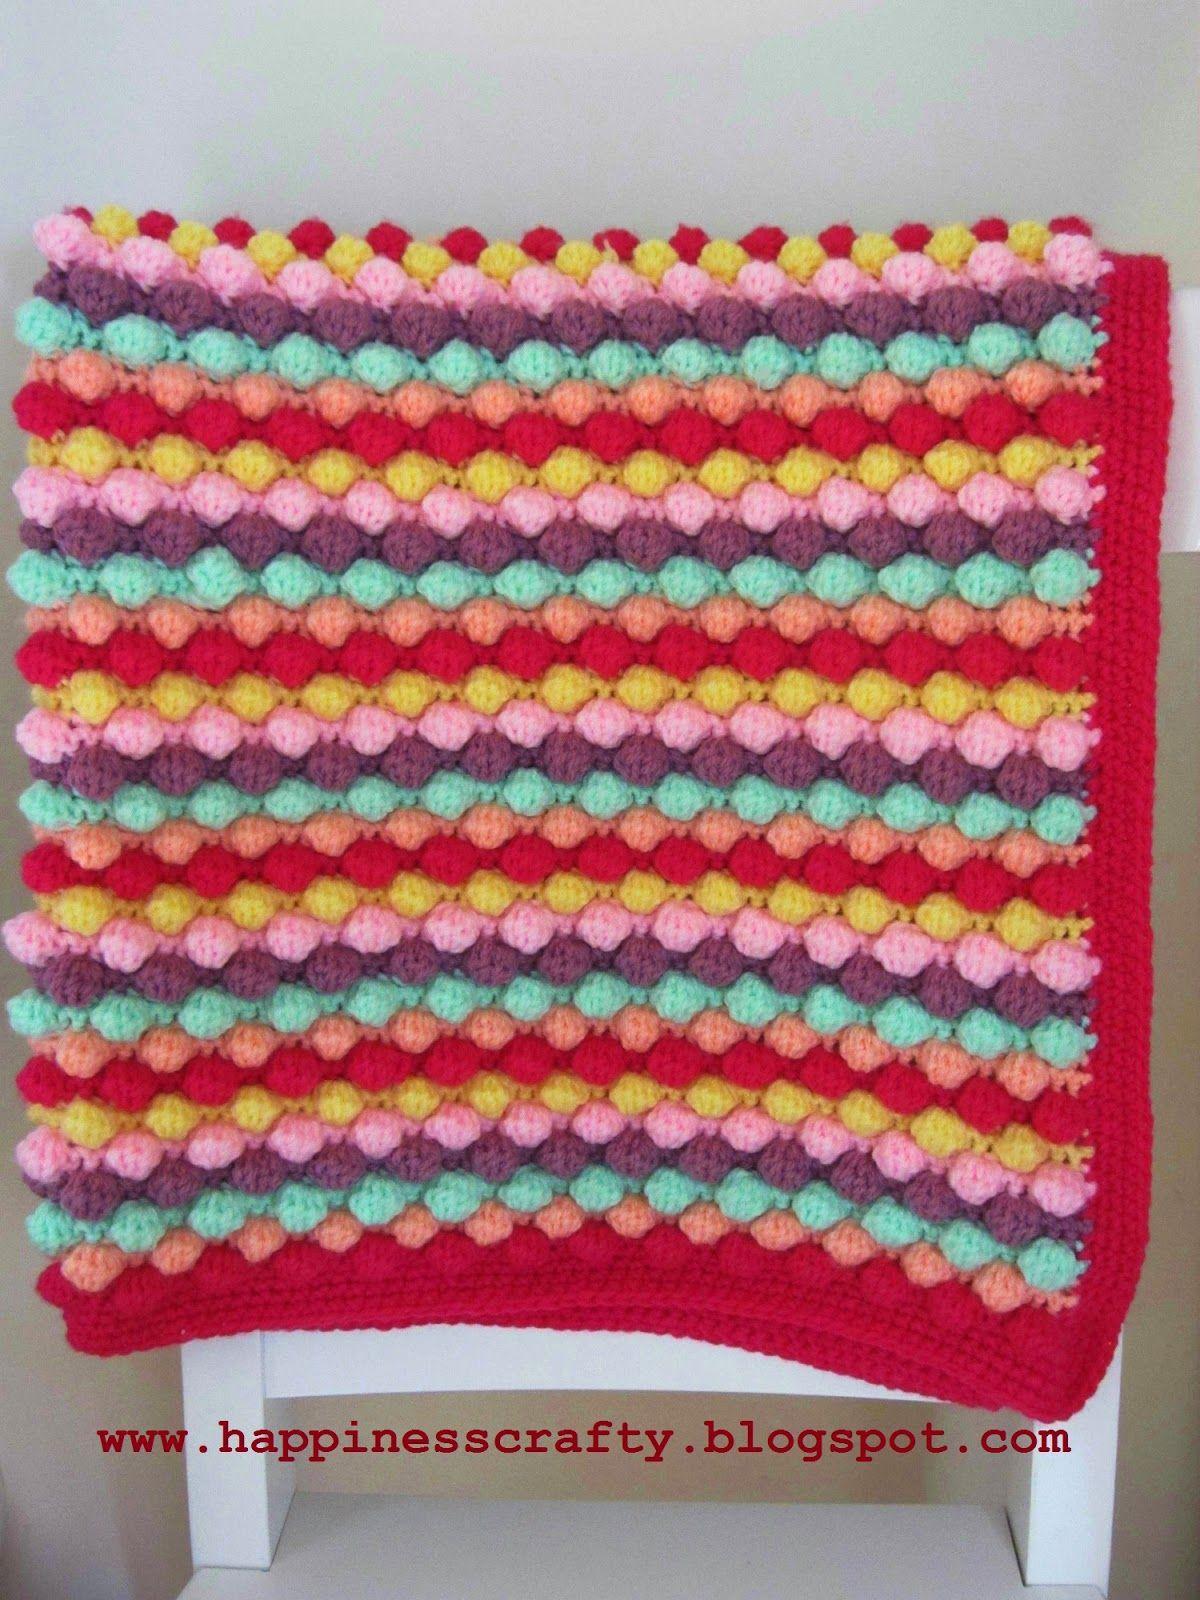 Happiness Crafty: Crochet Baby Girl Bobble Blanket ~ Free Pattern ...